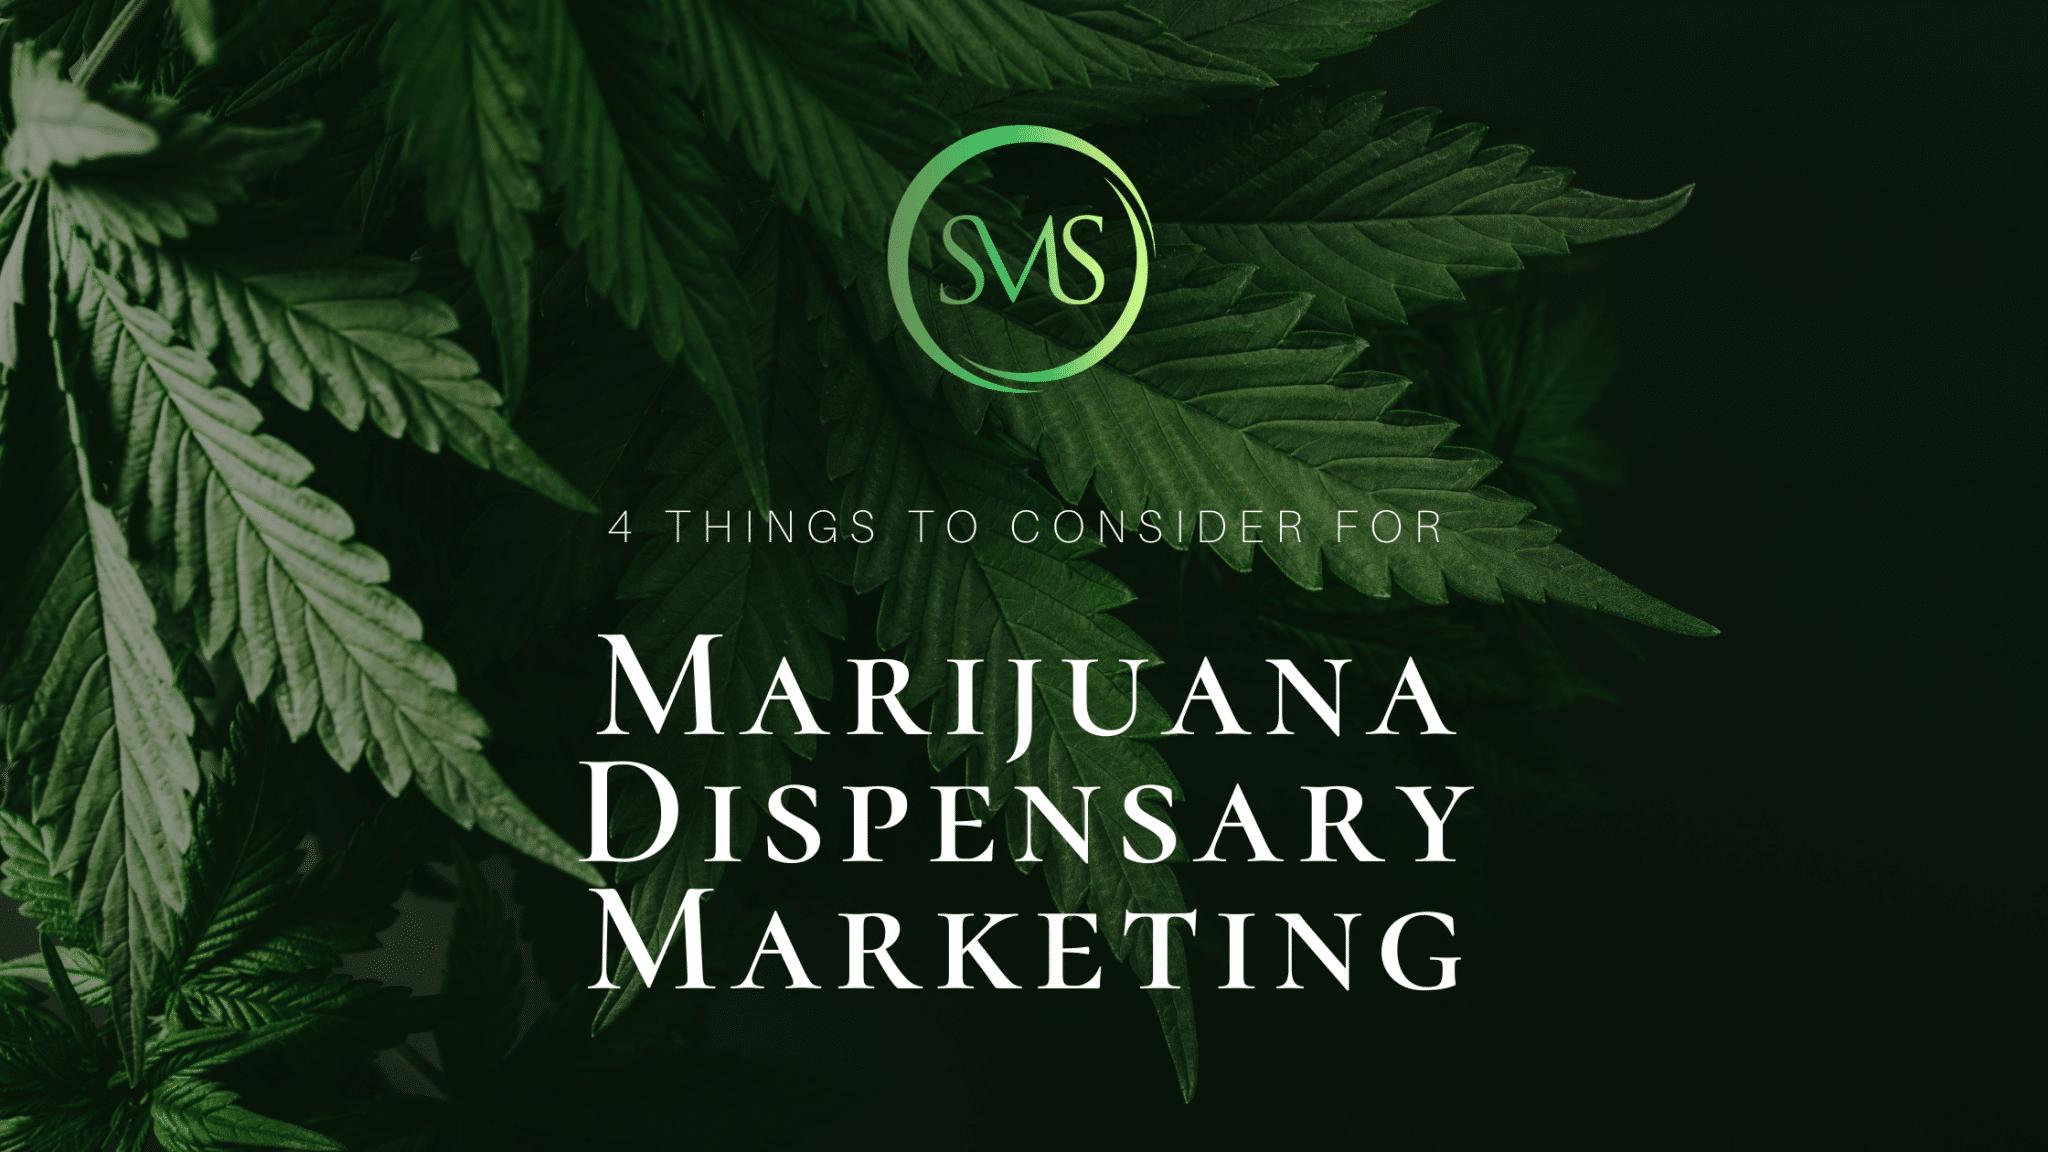 4 Things to Consider for Marijuana Dispensary Marketing